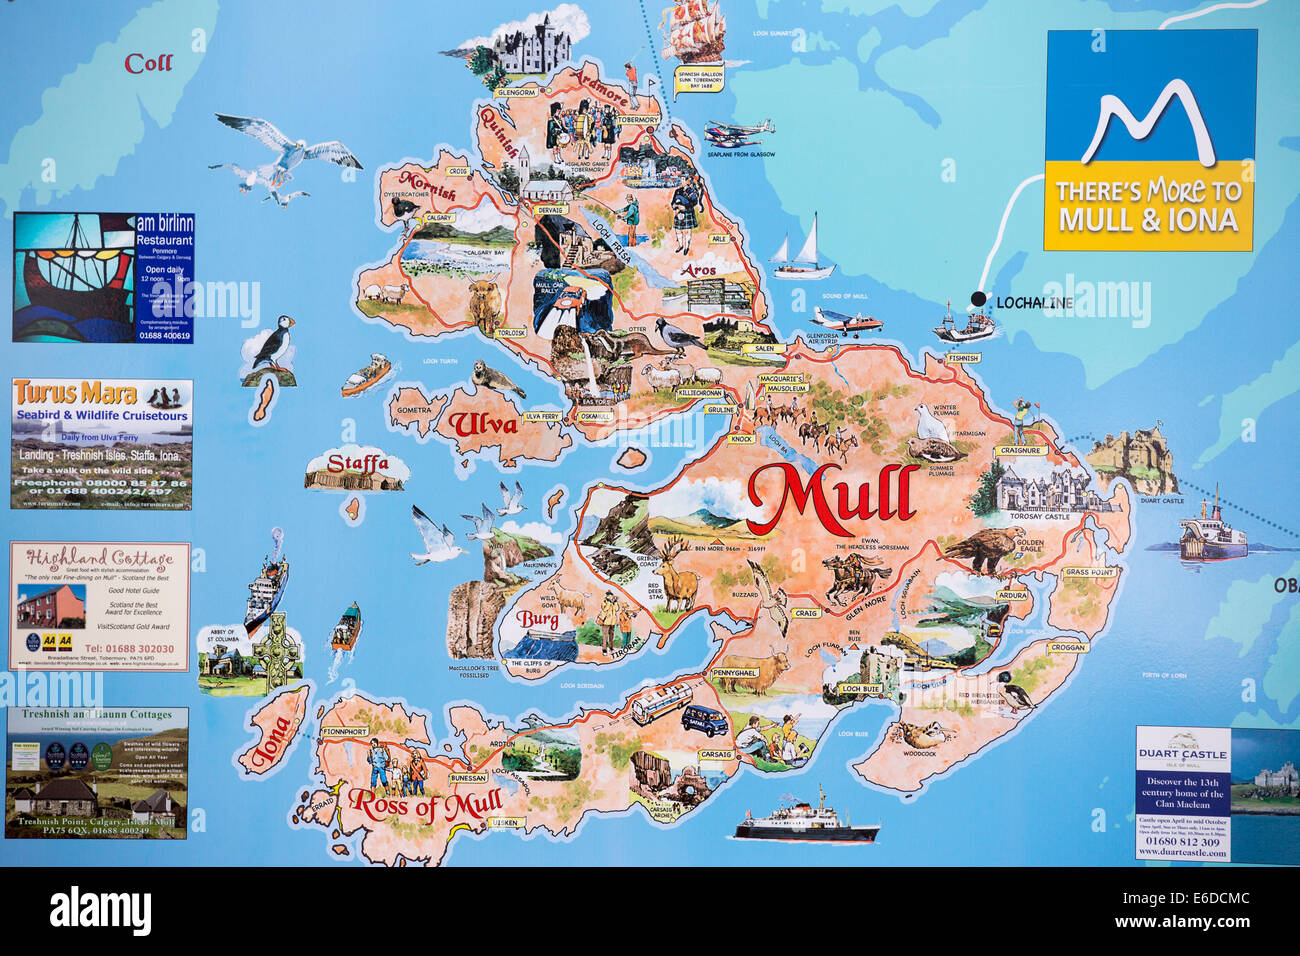 Isle Of Mull Map A map of the Isle of Mull, Scotland, UK Stock Photo: 72824764   Alamy